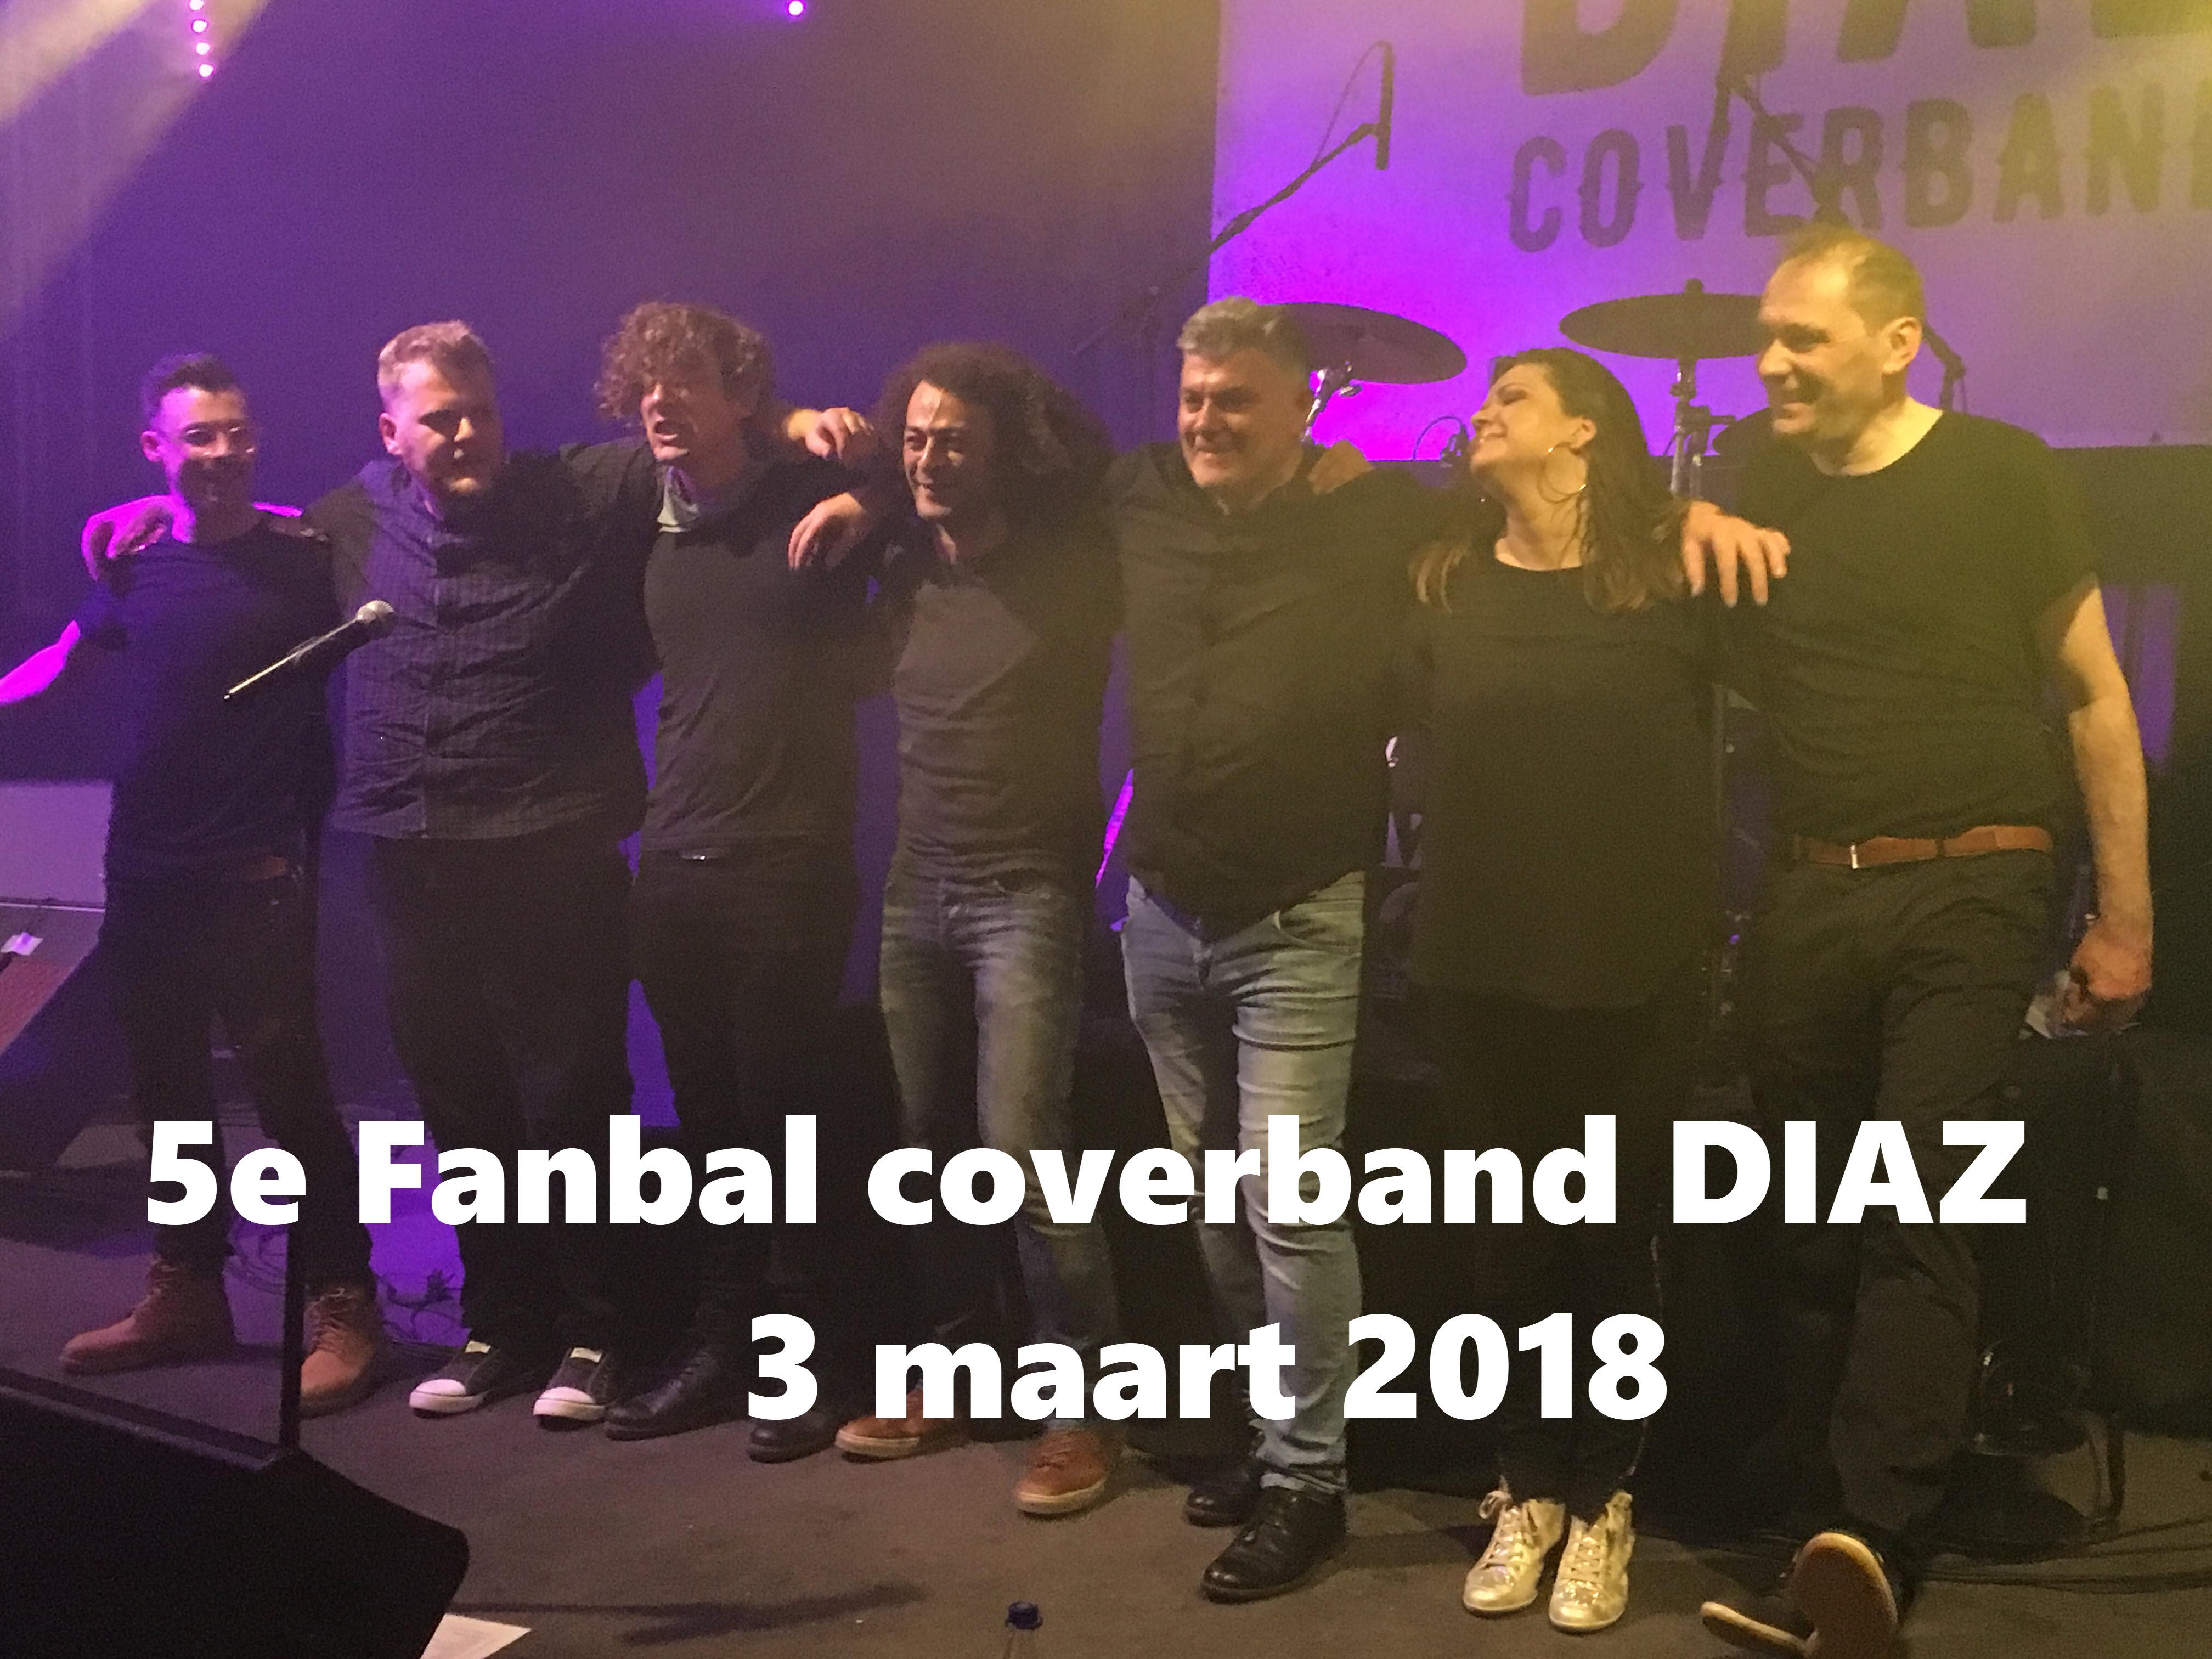 Coverband Diaz fanbal 2018_0